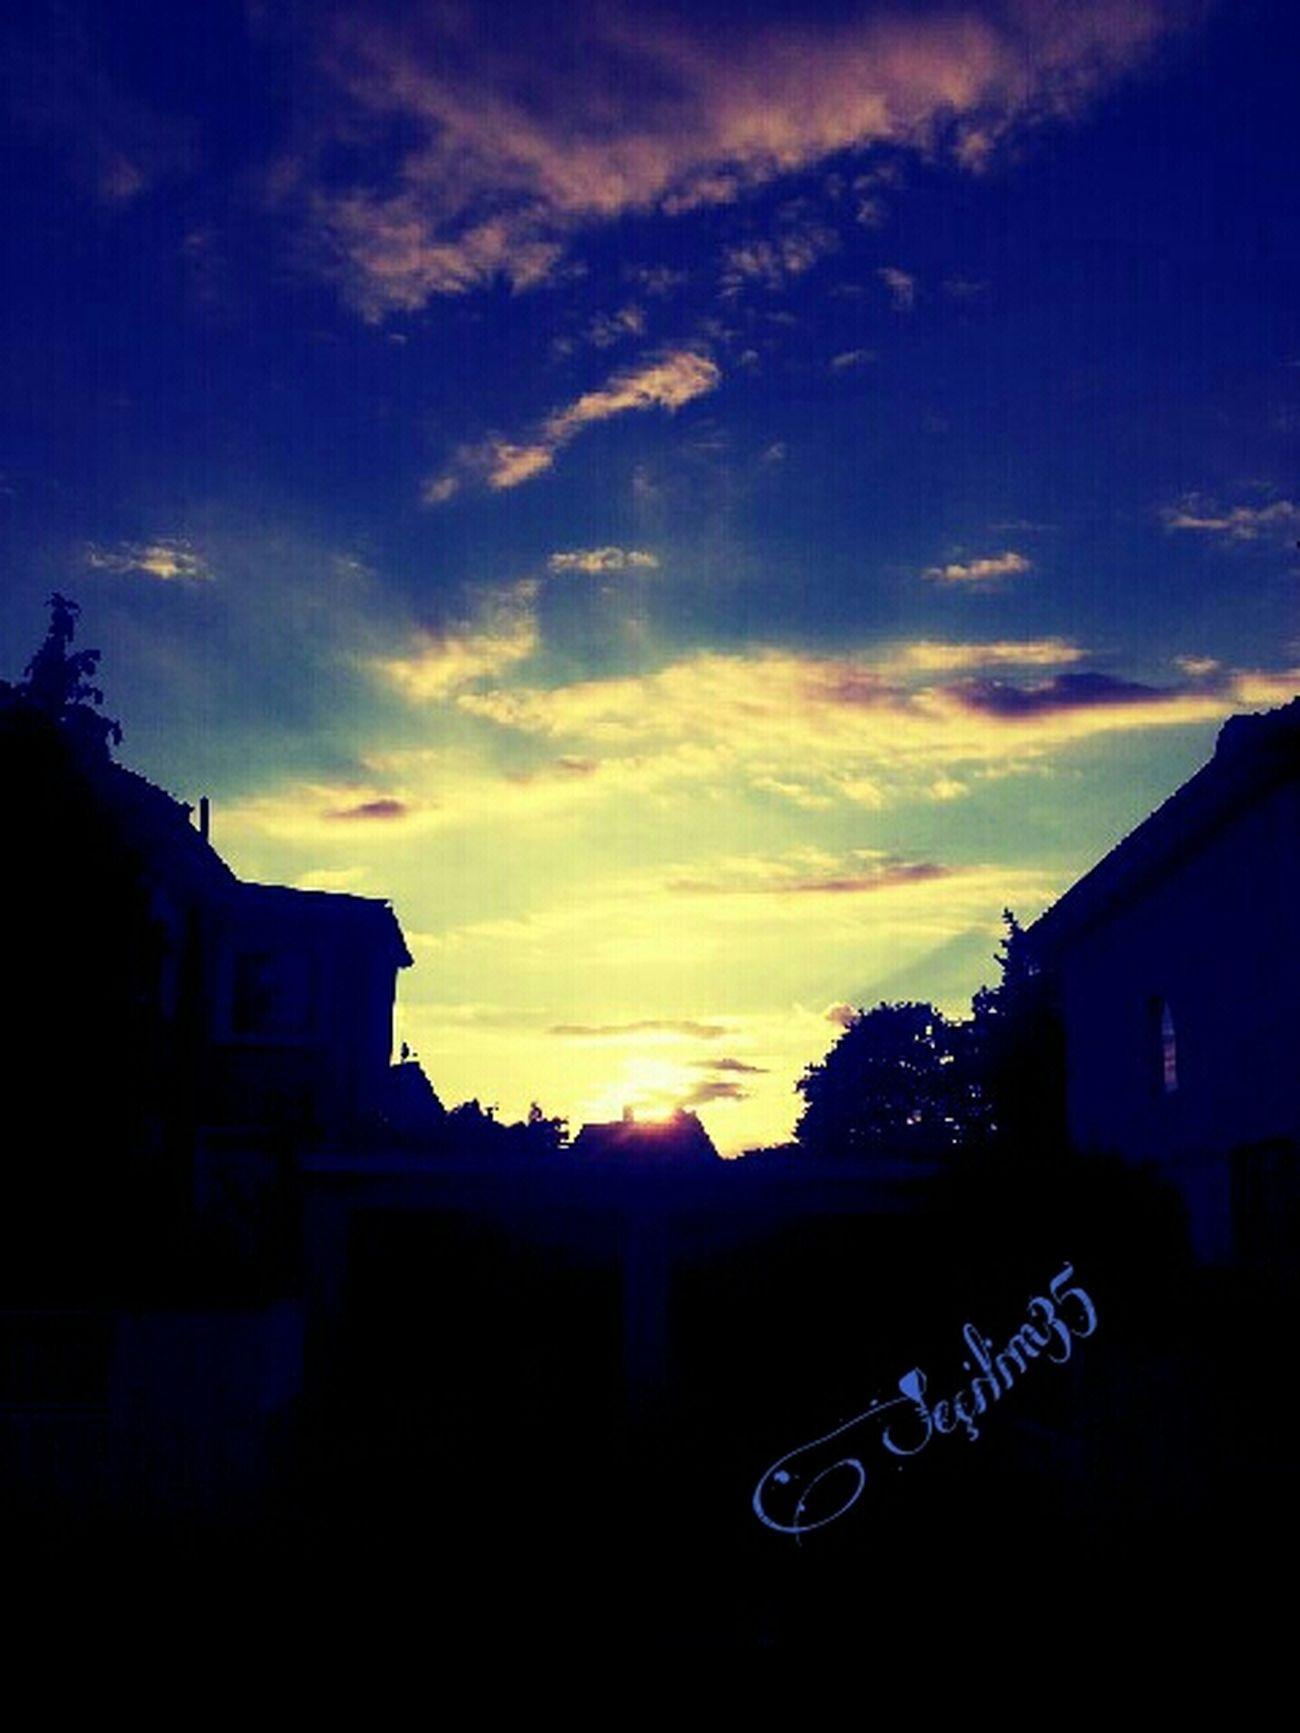 Günes her gün guzellikleriyle dogar... Love Enjoying The Sun Taking Photos Enjoying The View Enjoying Life Clouds And Sky Sun_collection Nature_collection Sun Happy